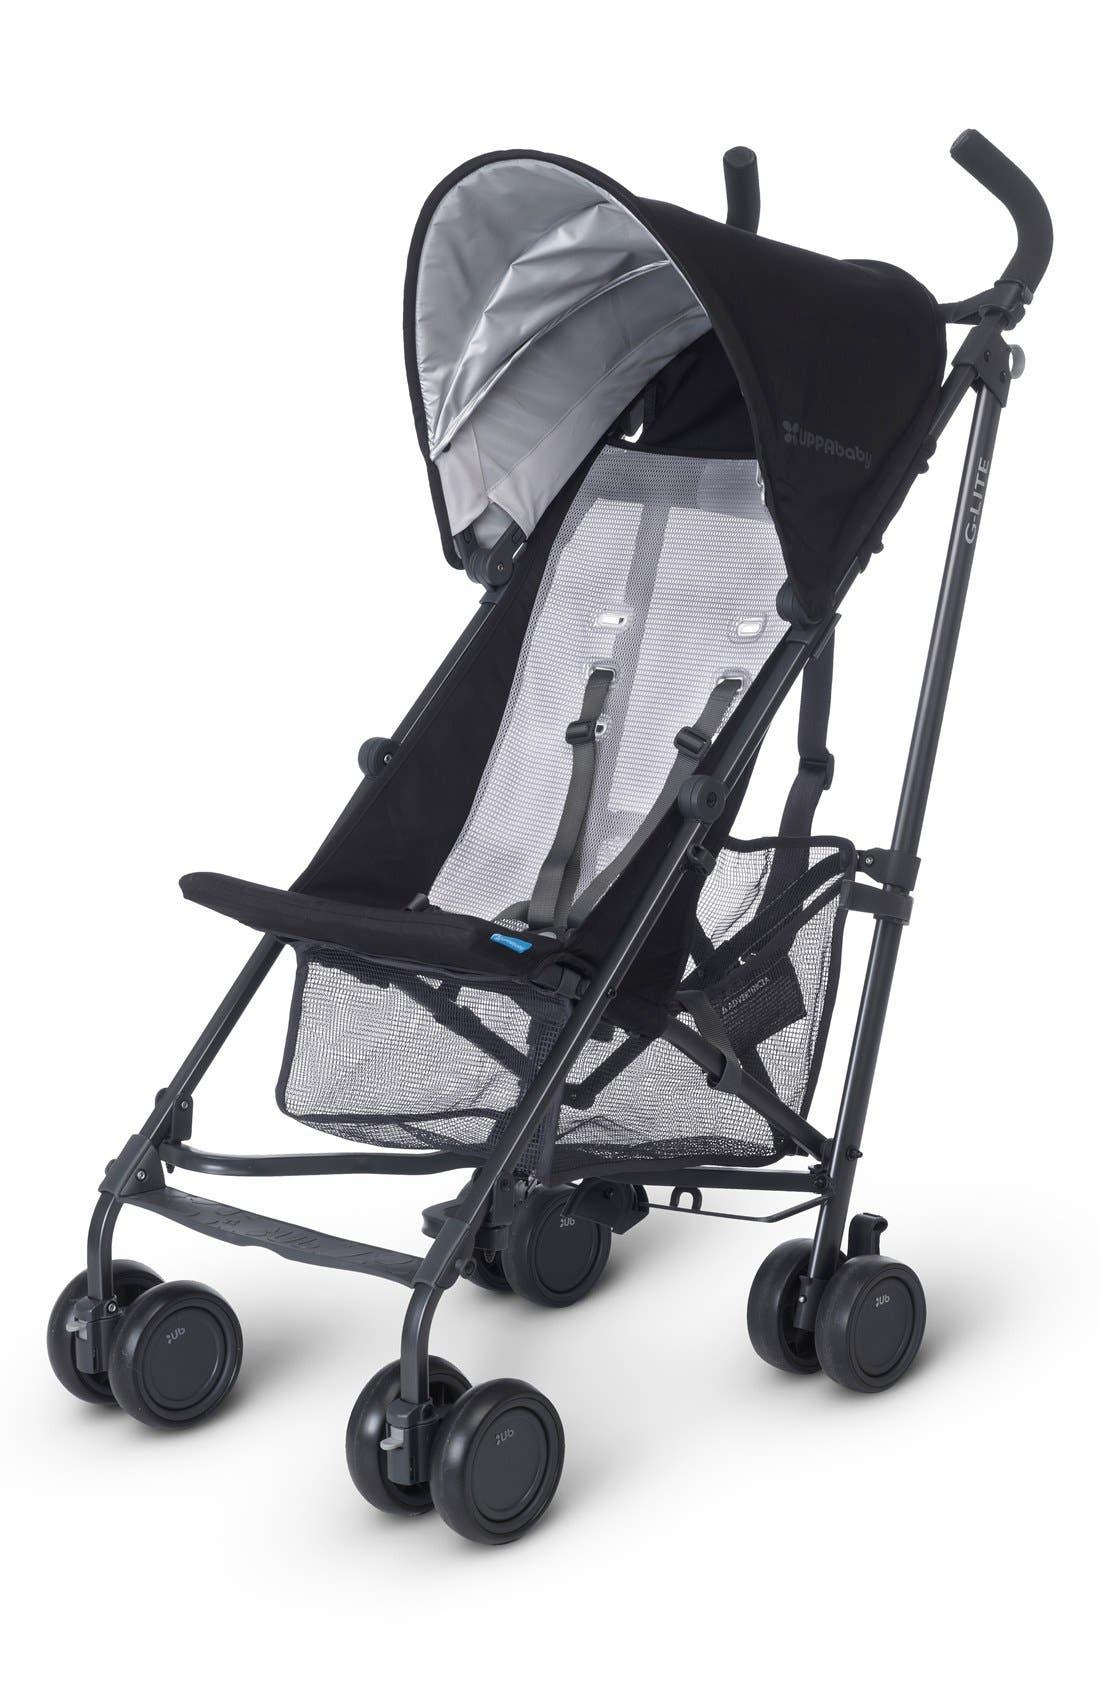 Main Image - UPPAbaby G-LITE - Black Frame Stroller